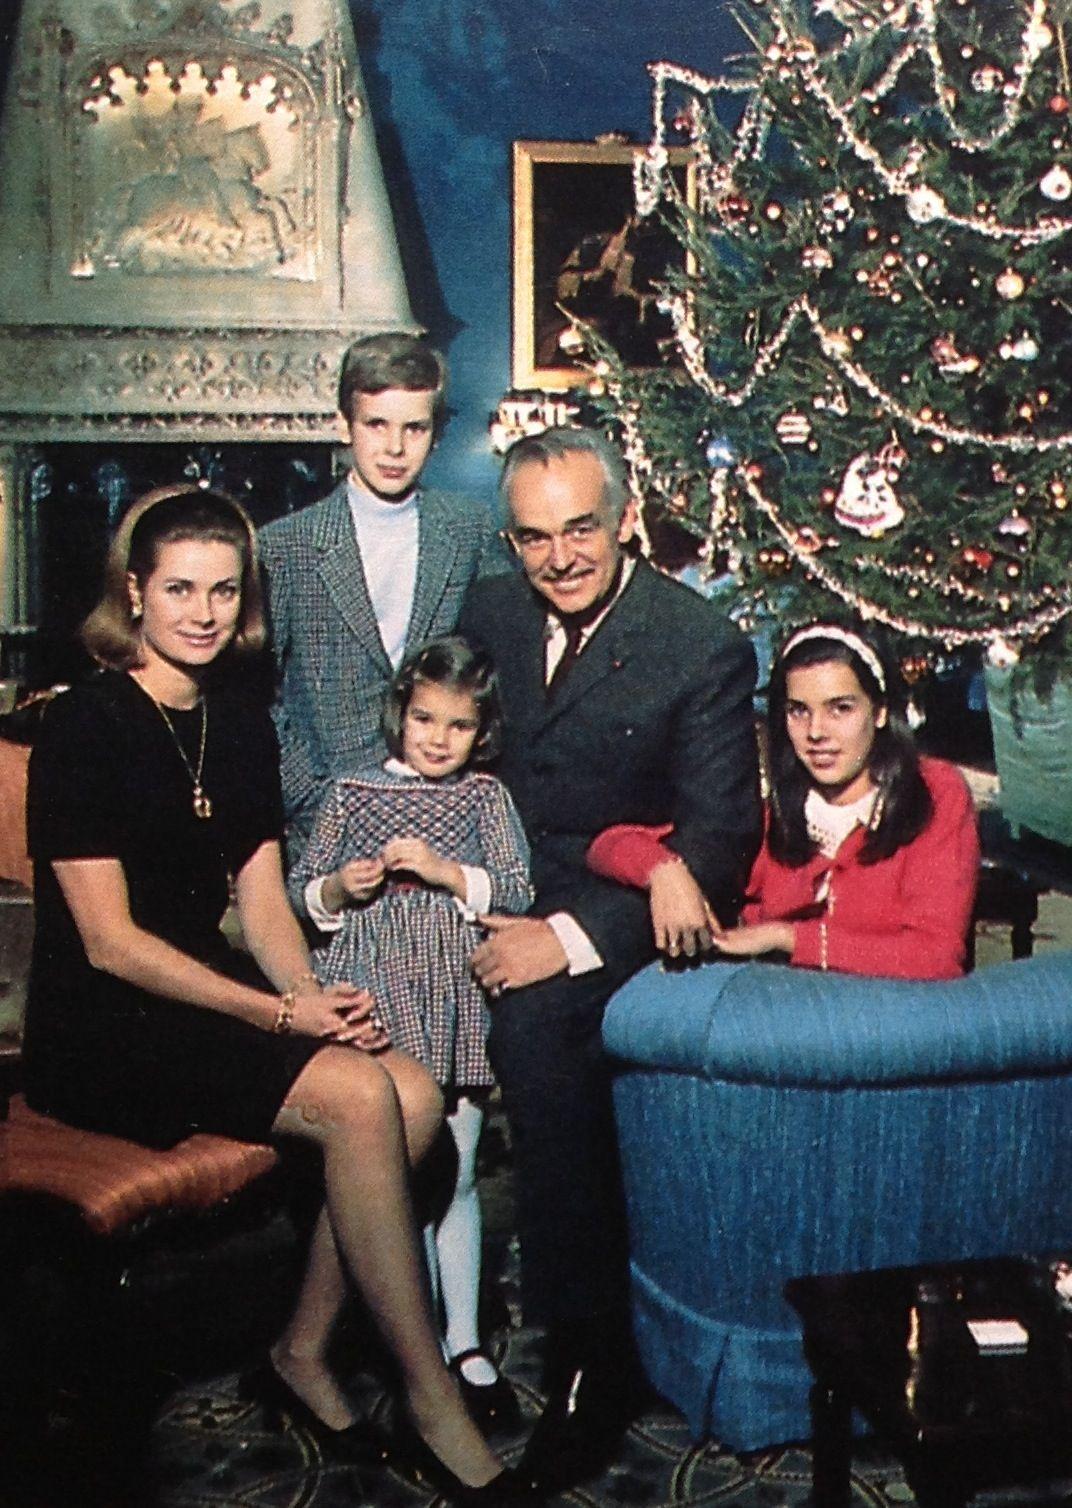 Monaco royal family 1970